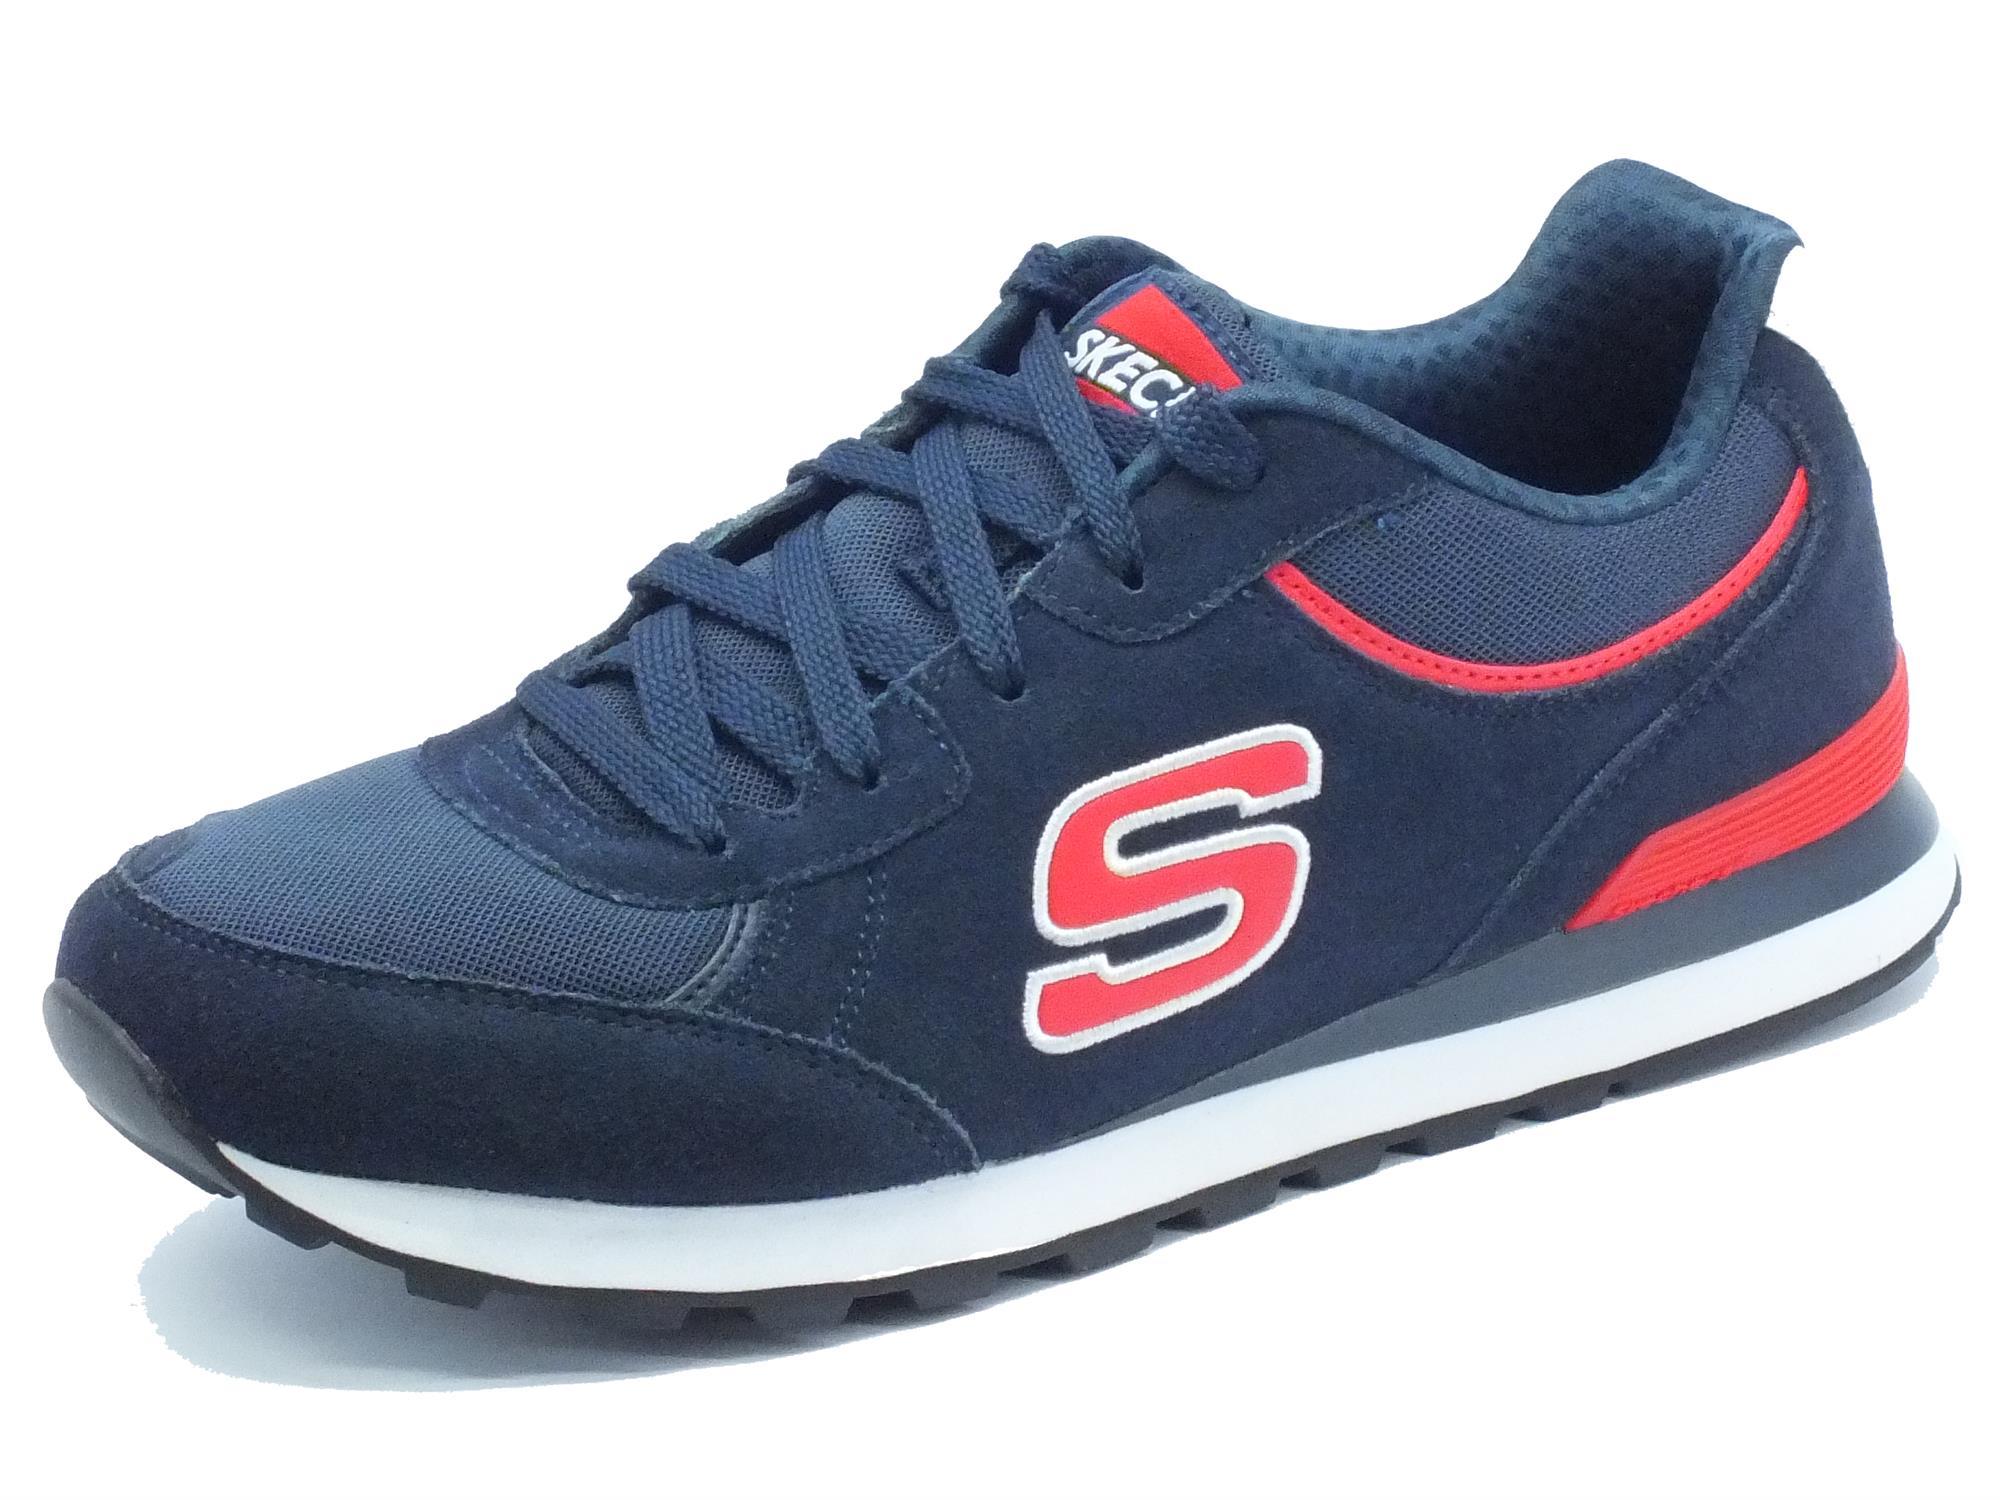 Scarpe Skechers Original per uomo in pelle e tessuto blu